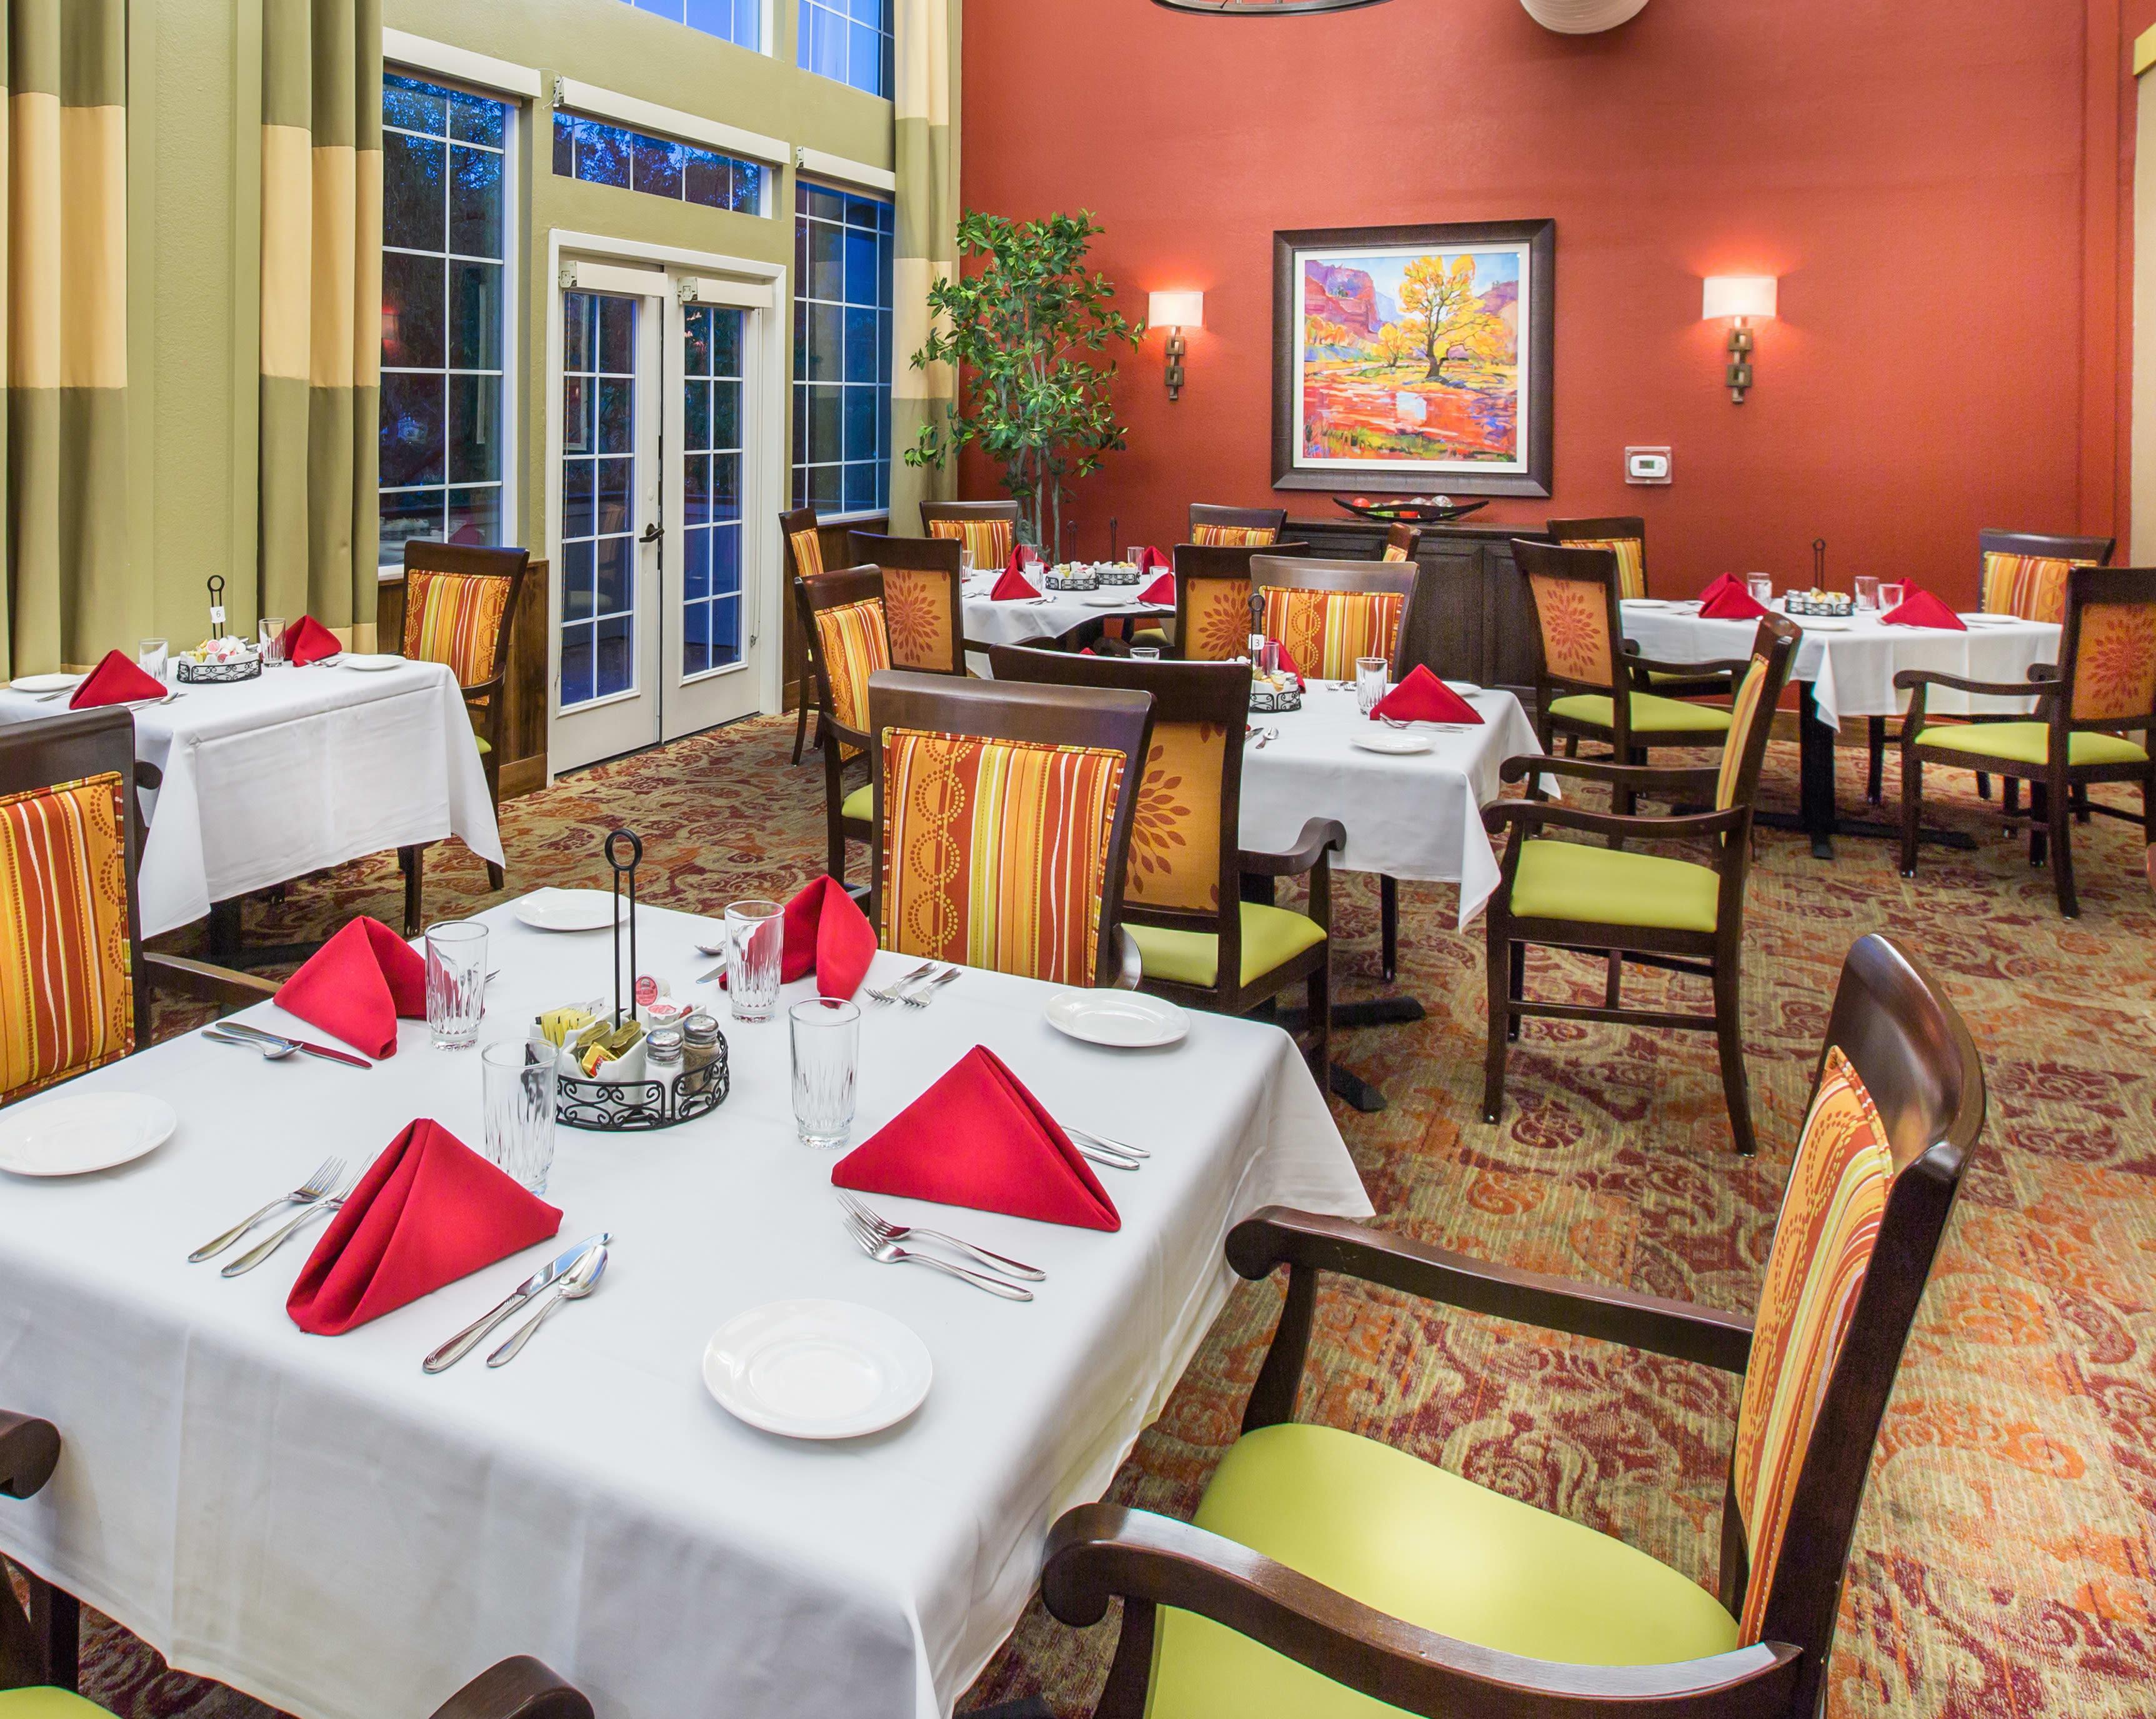 Decorative dining area at Oakmont Gardens in Santa Rosa, California